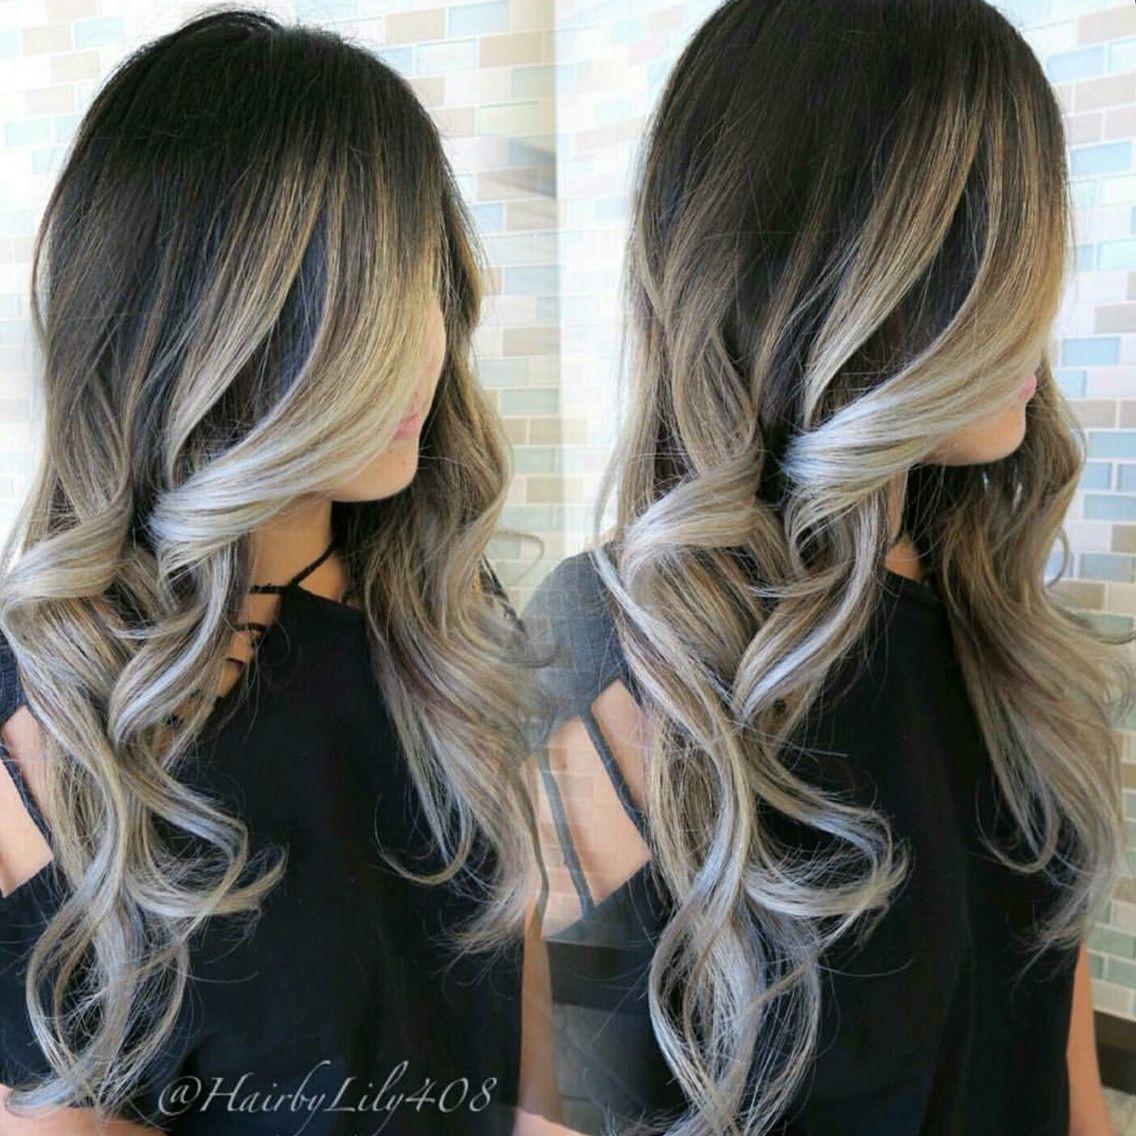 Ballayage Blond avec guy tang. kenra color. | hair couleur & ballayage | pinterest